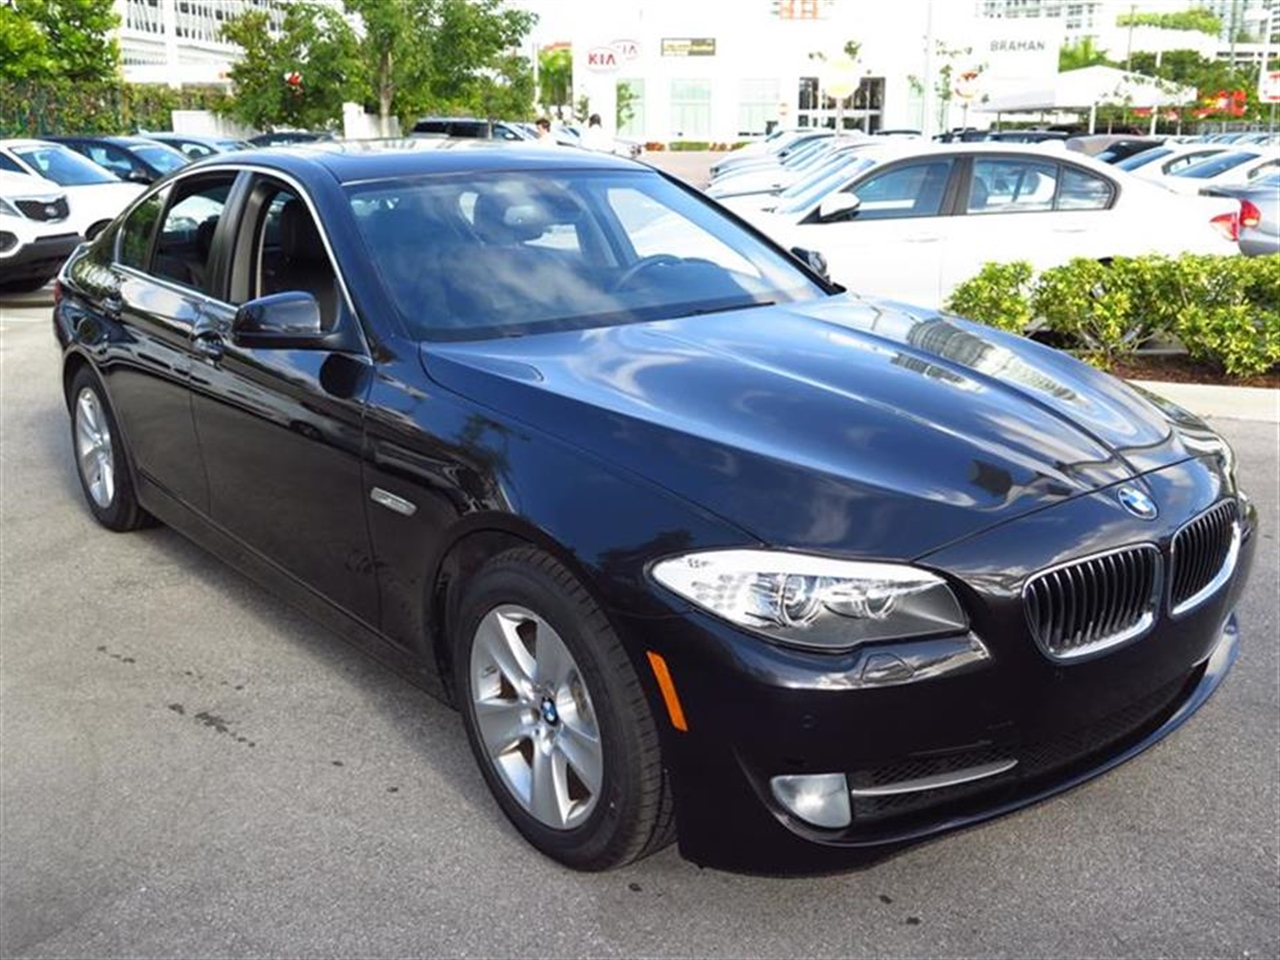 2012 BMW 5 SERIES 4dr Sdn 528i RWD 30971 miles 10-way power-adjustable front bucket seats -inc 4